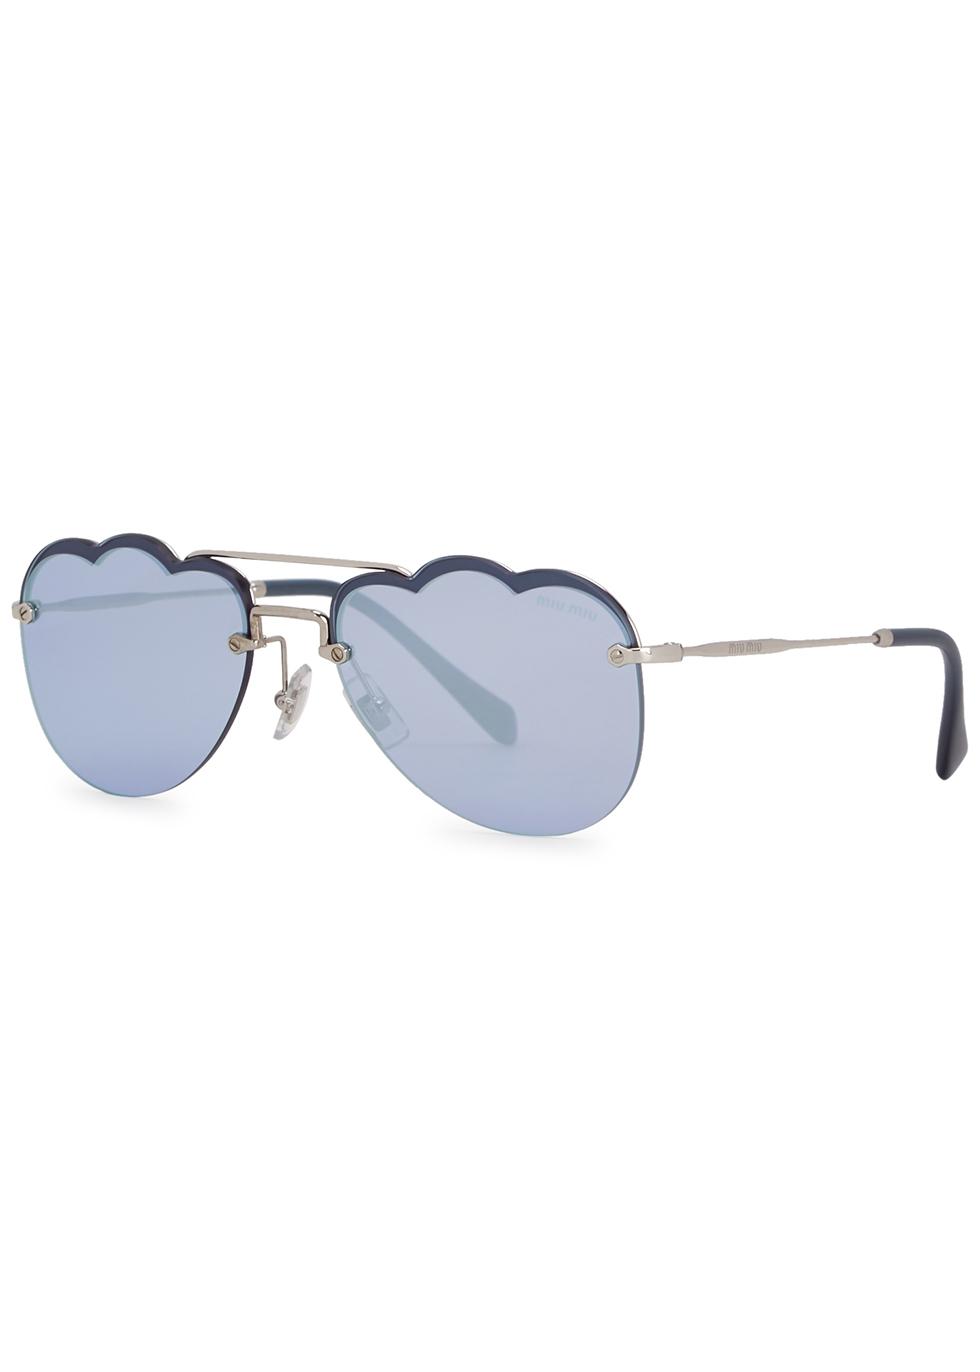 Blue scalloped aviator-style sunglasses - Miu Miu